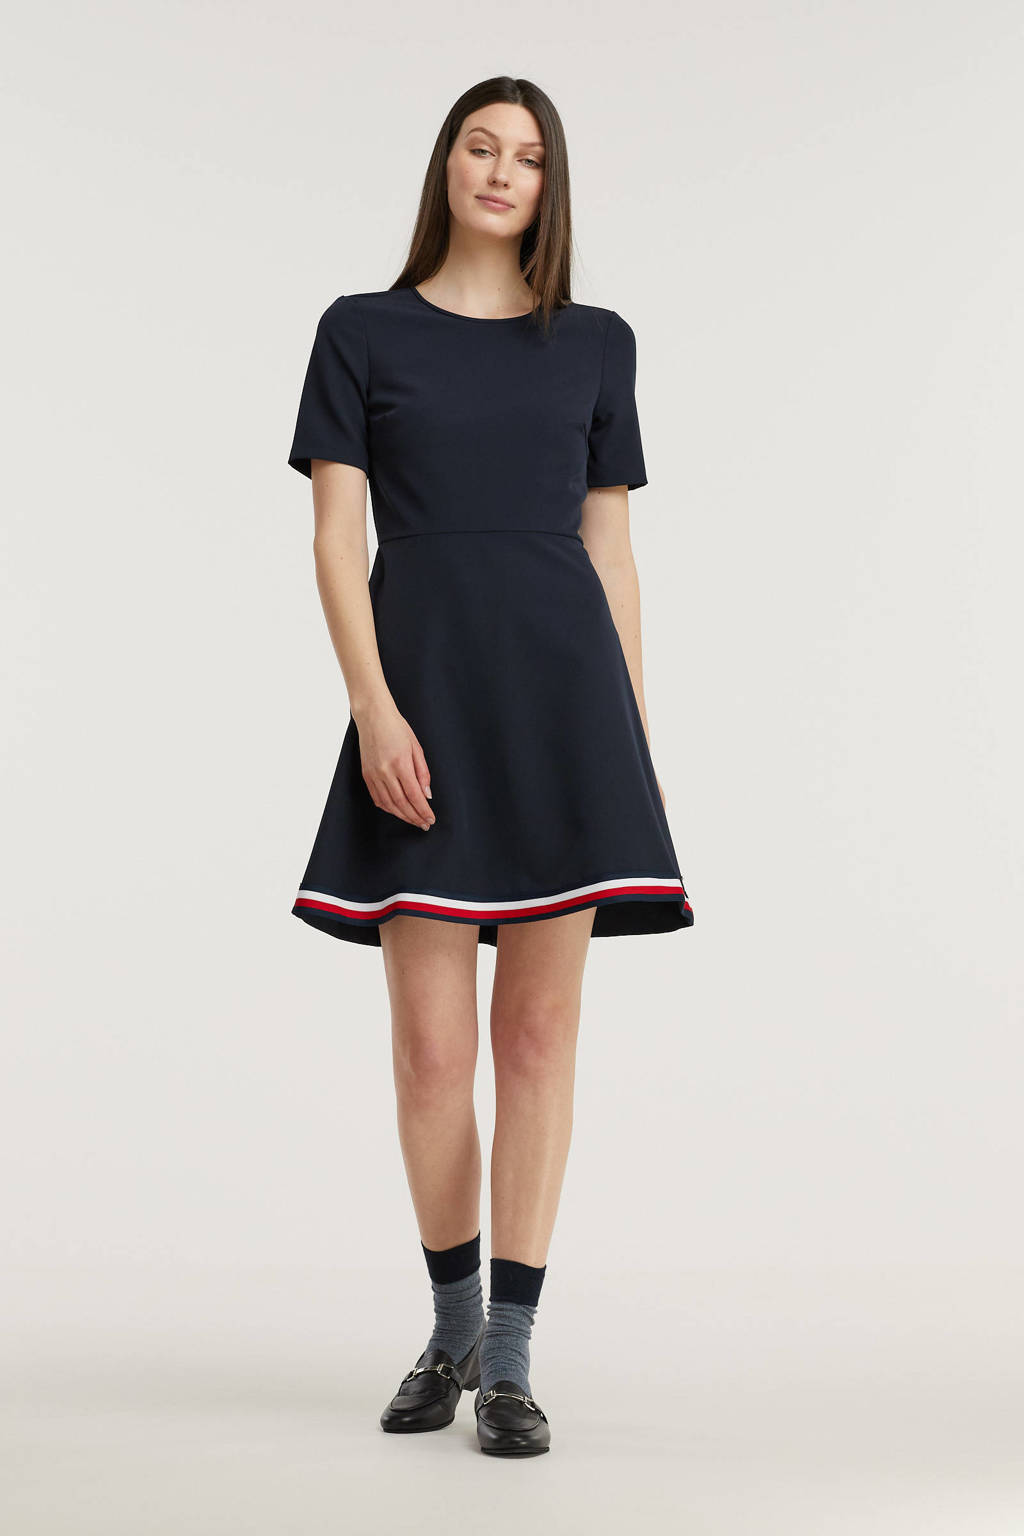 Tommy Hilfiger A-lijn jurk donkerblauw/wit/rood, Donkerblauw/wit/rood